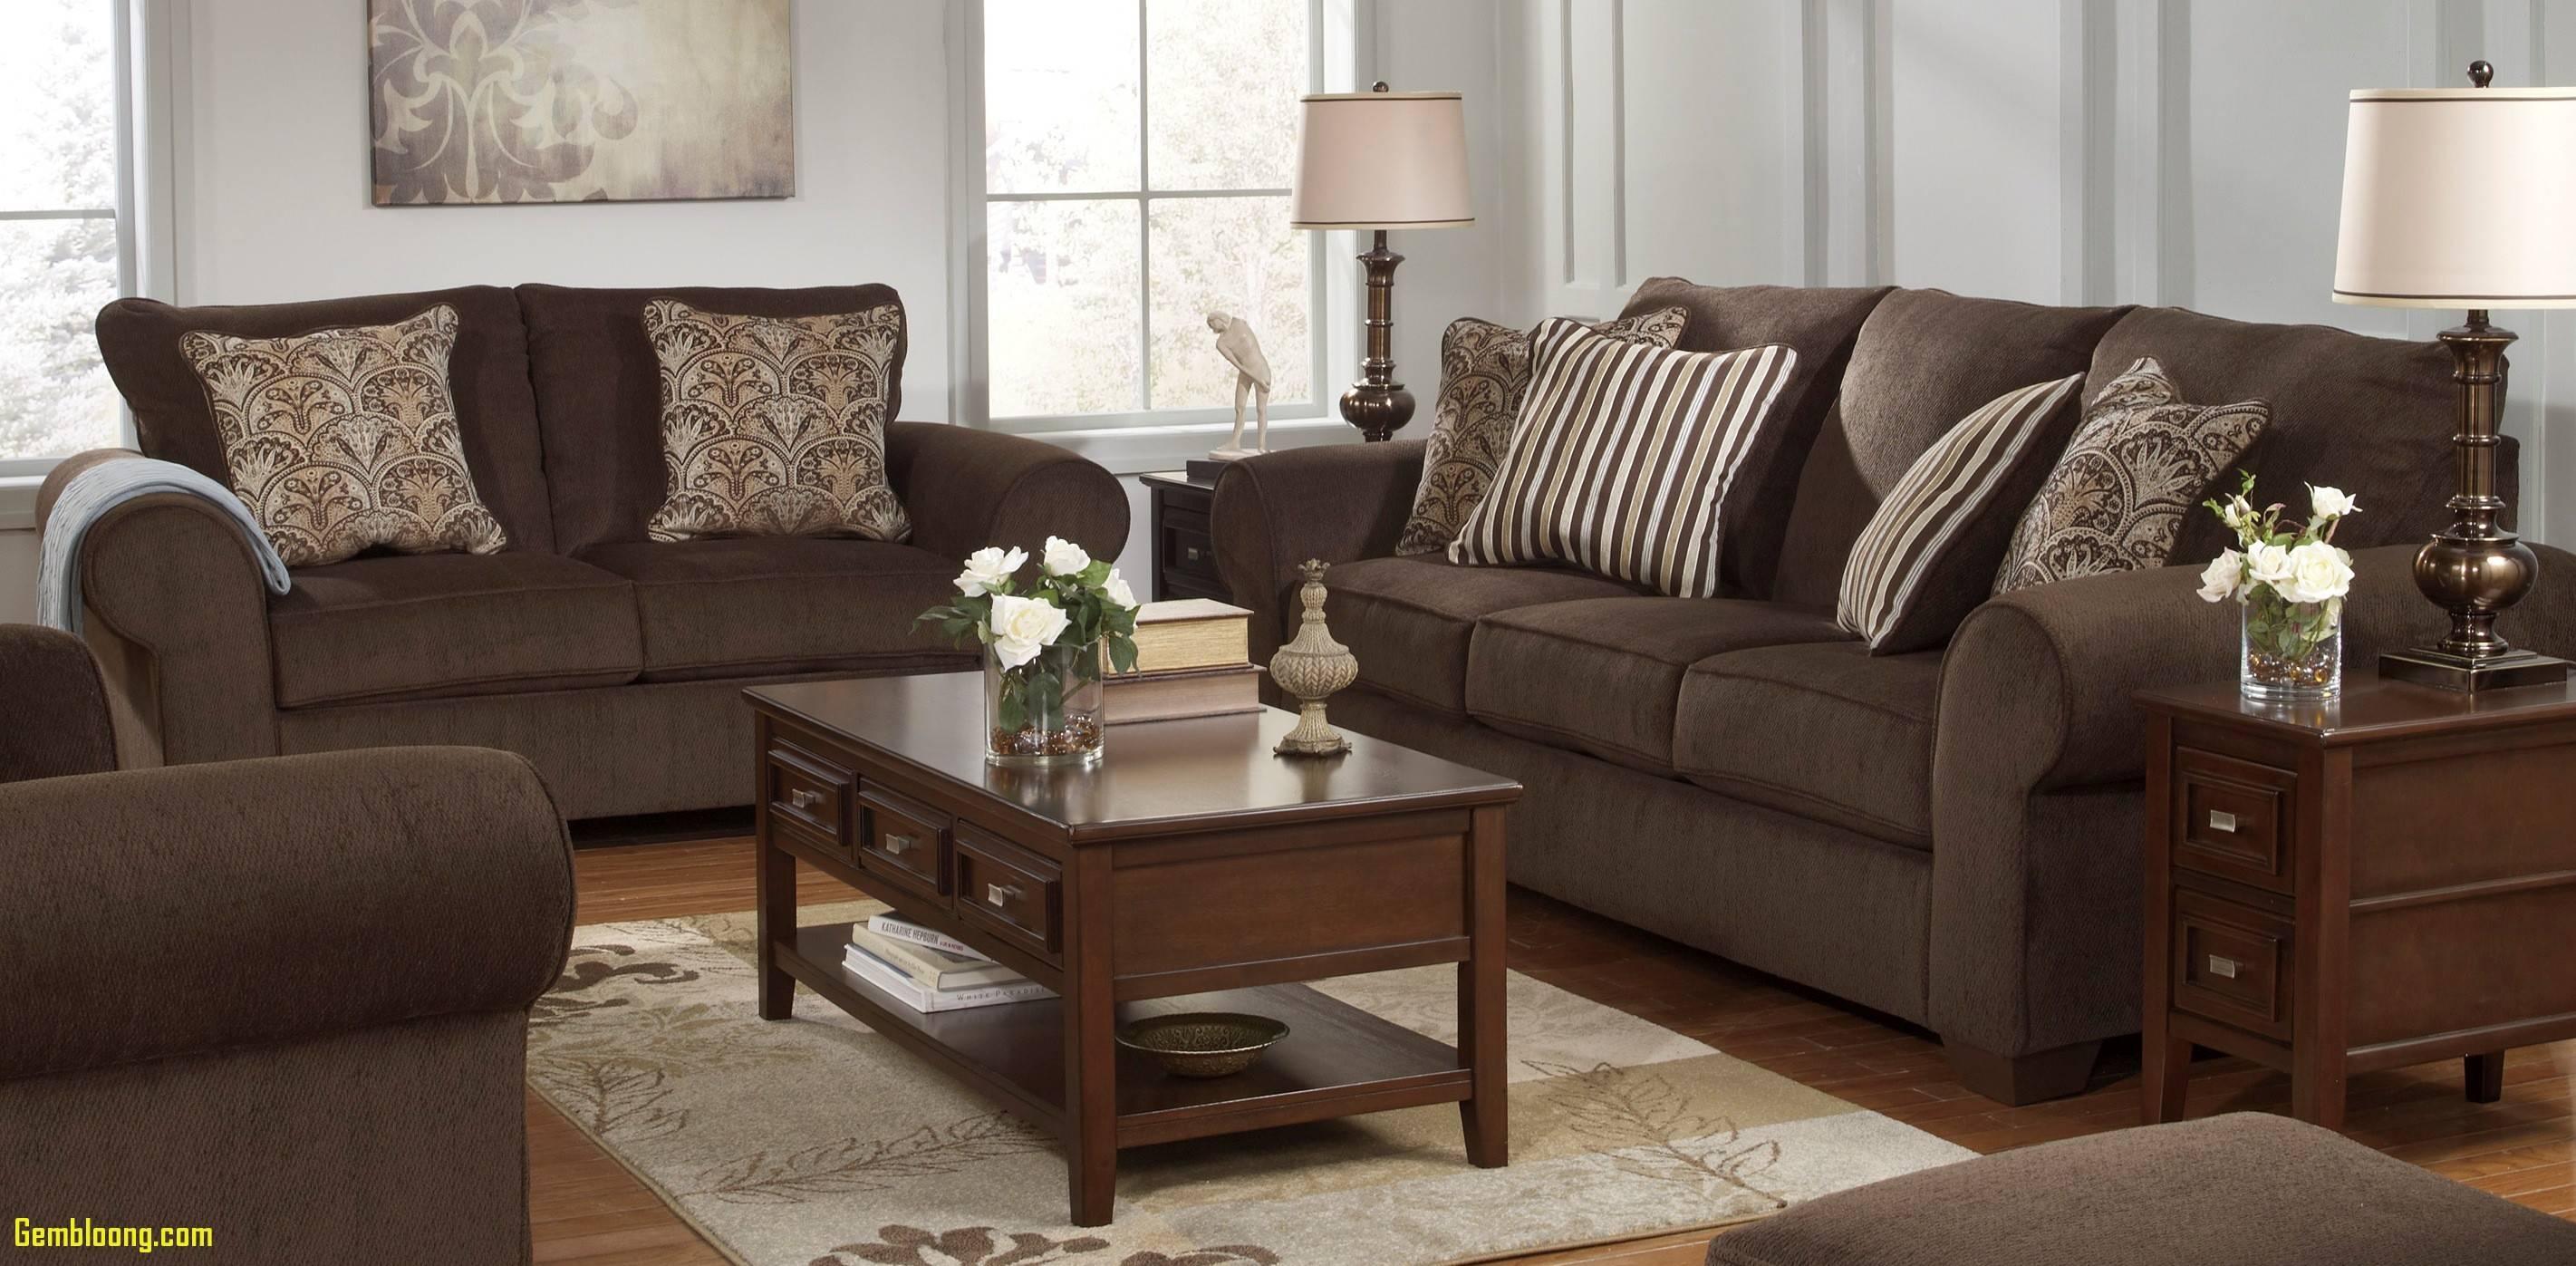 Beautiful Living Room Sets Cheap Modern Home Design - Cute ...